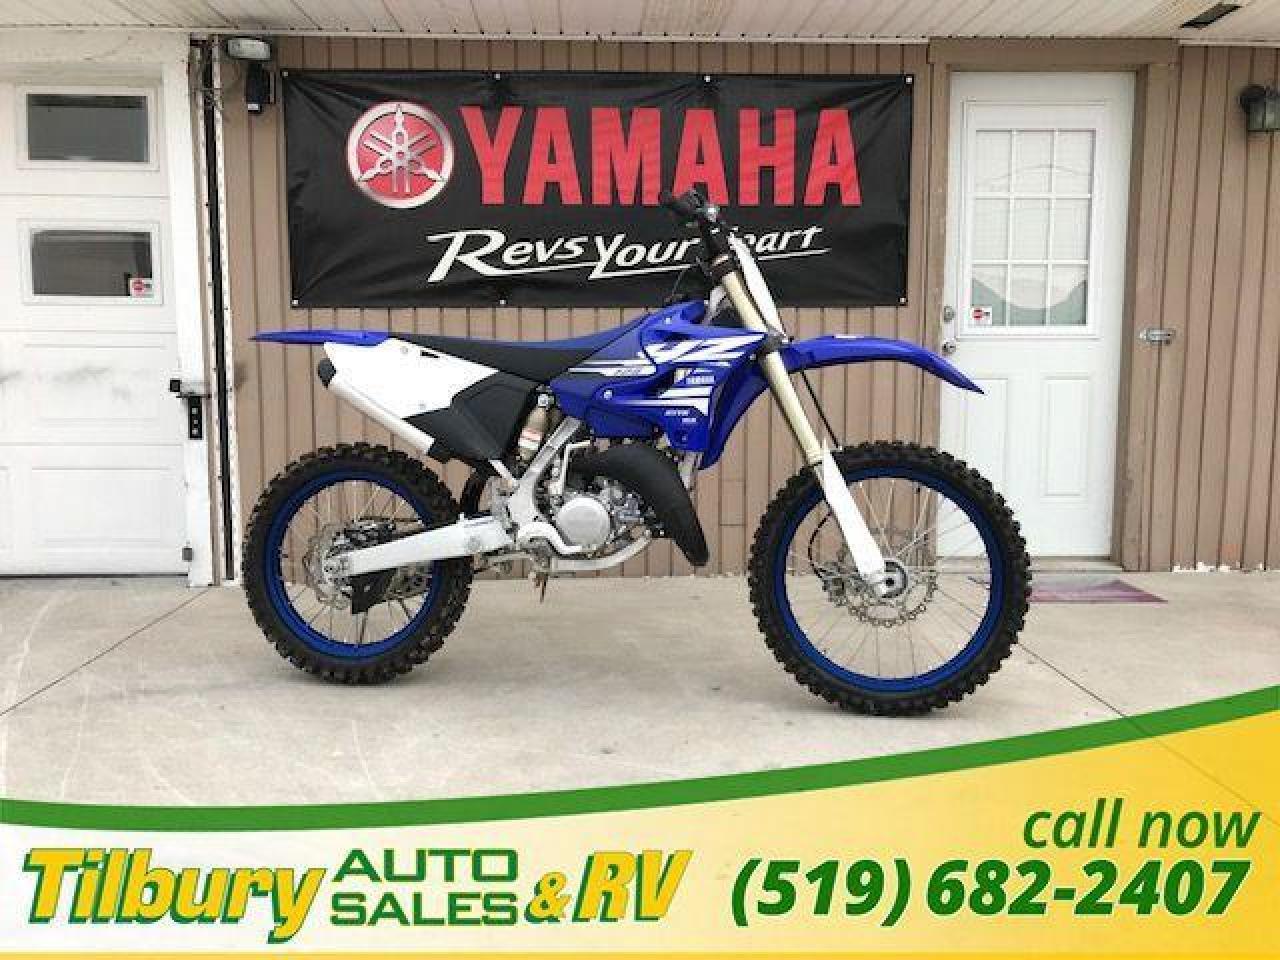 2018 Yamaha YZ125 2 STROKE, 124cc engine